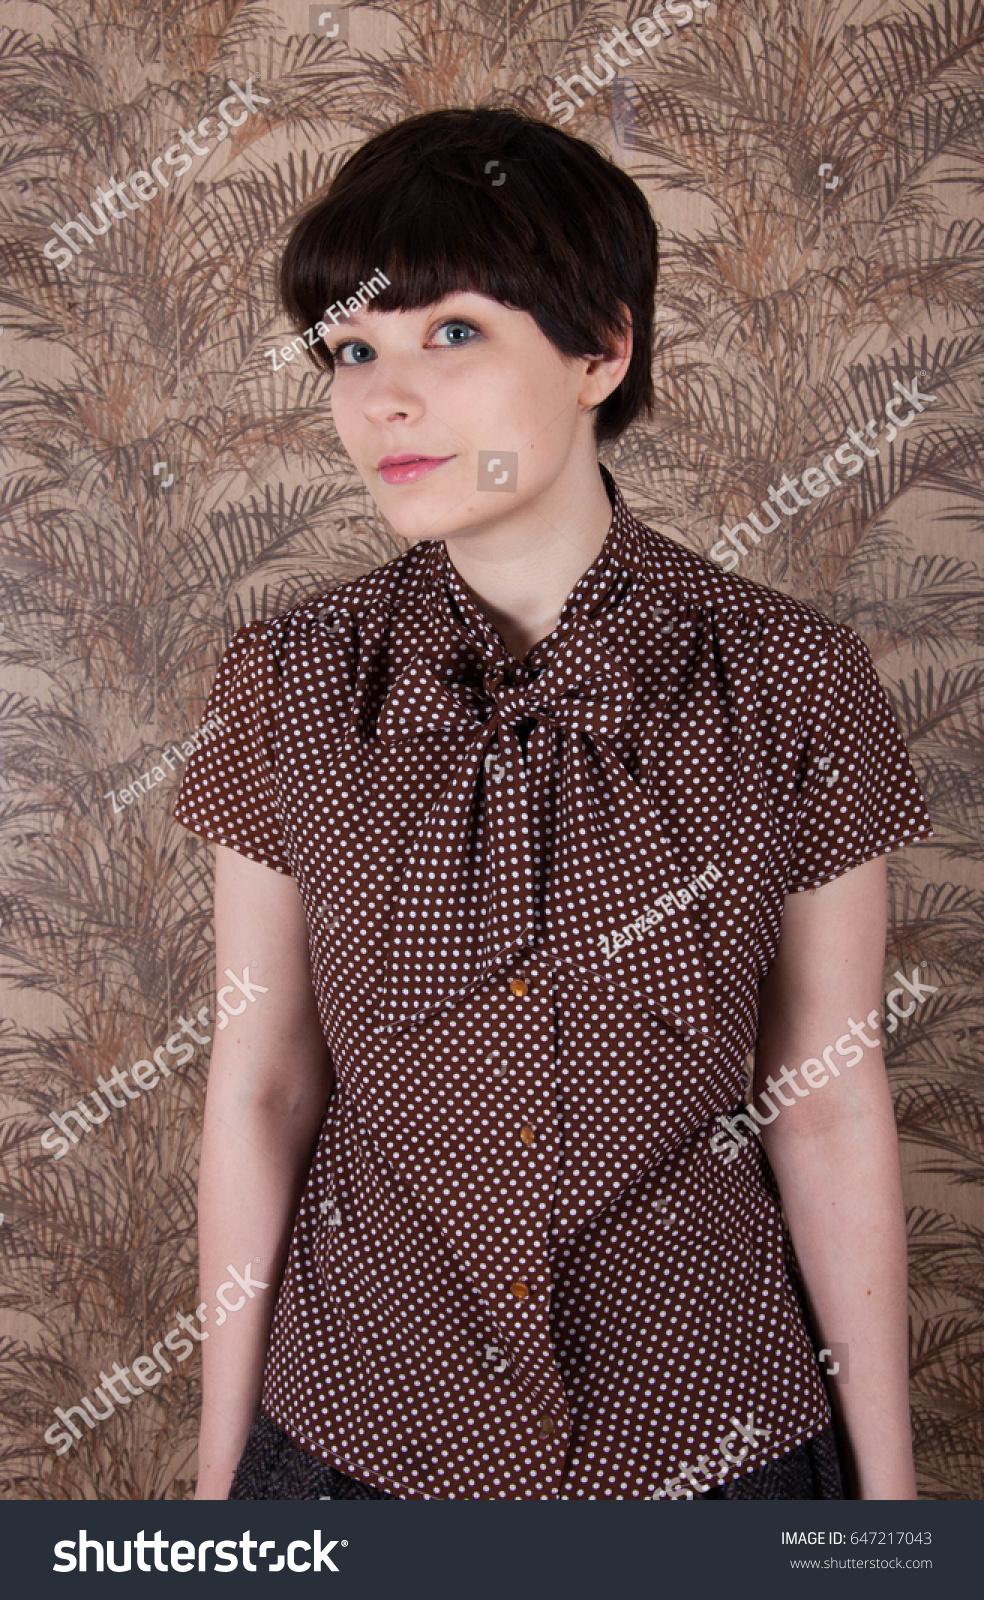 tranny-shorthaired-cute-teen-pics-asian-teen-naughty